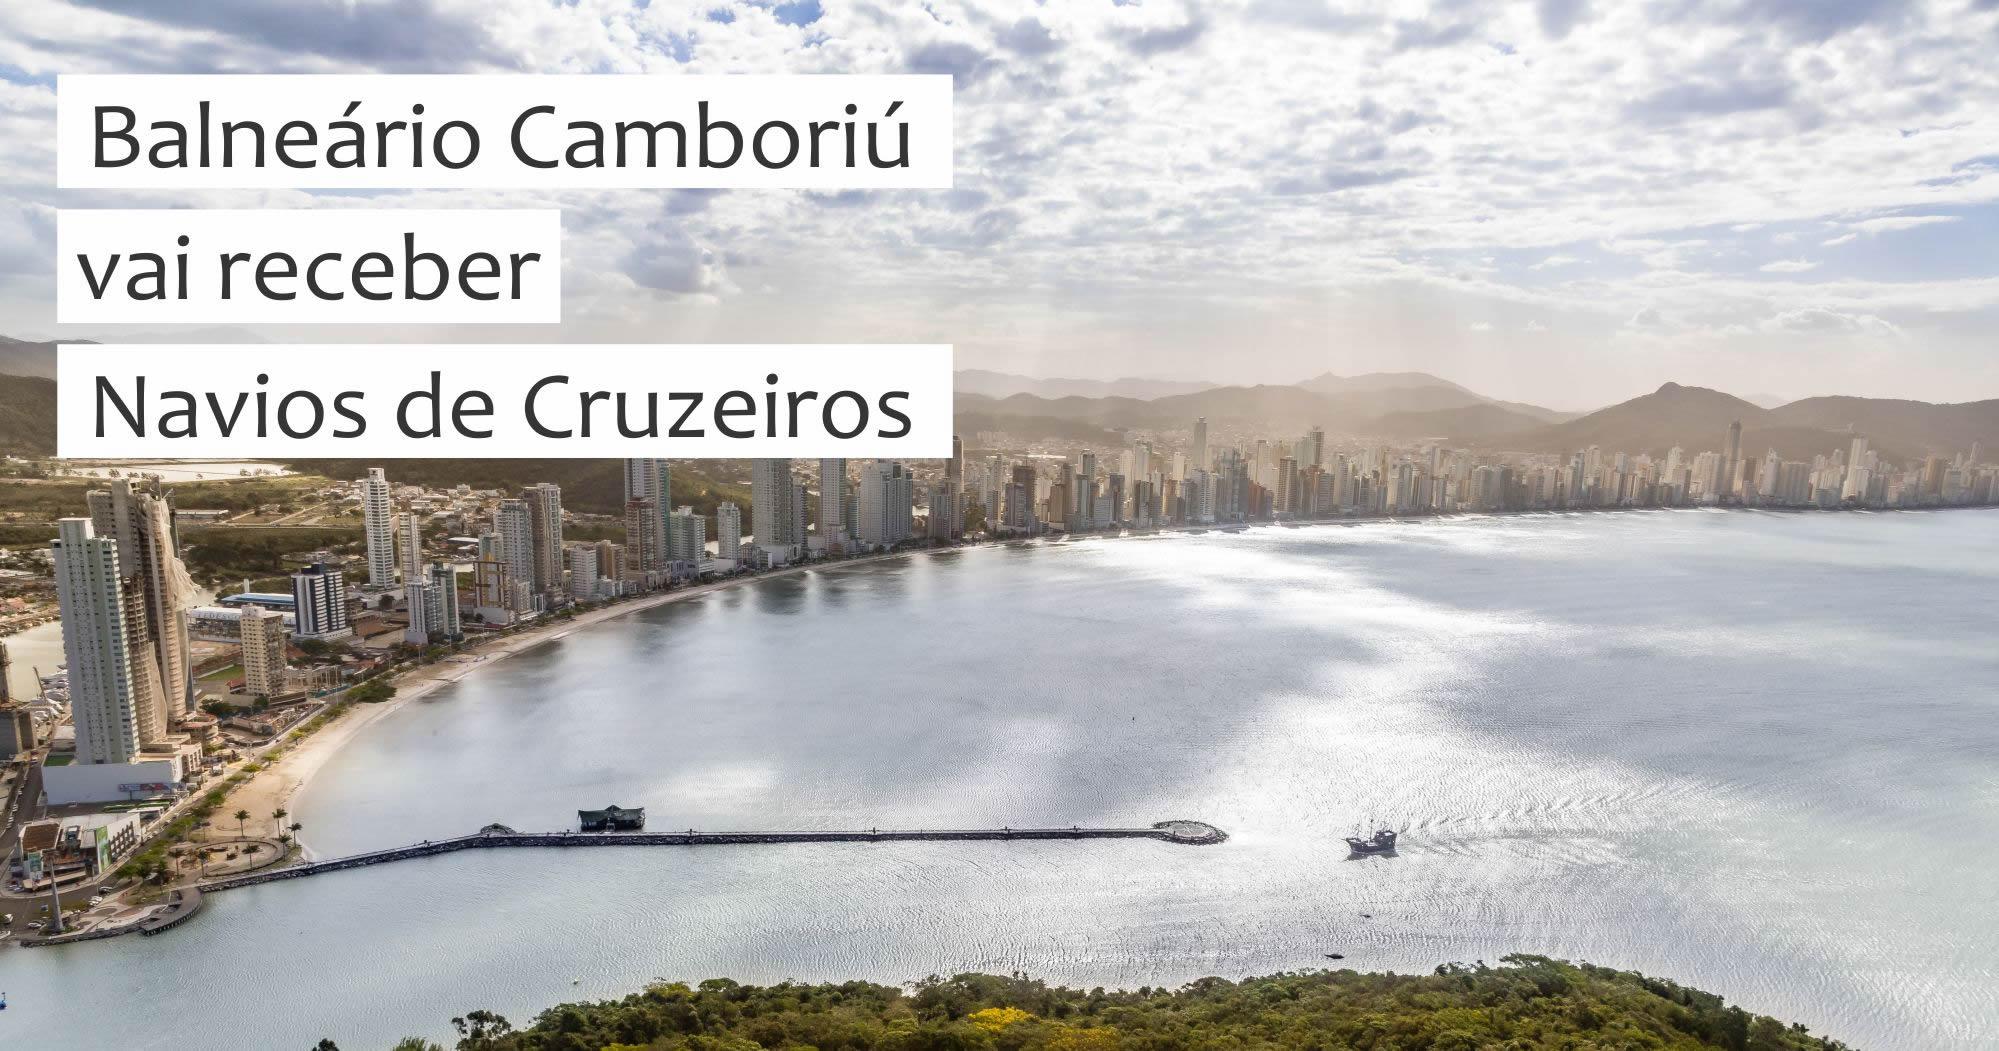 Balneário Camboriú vai receber navios de cruzeiros